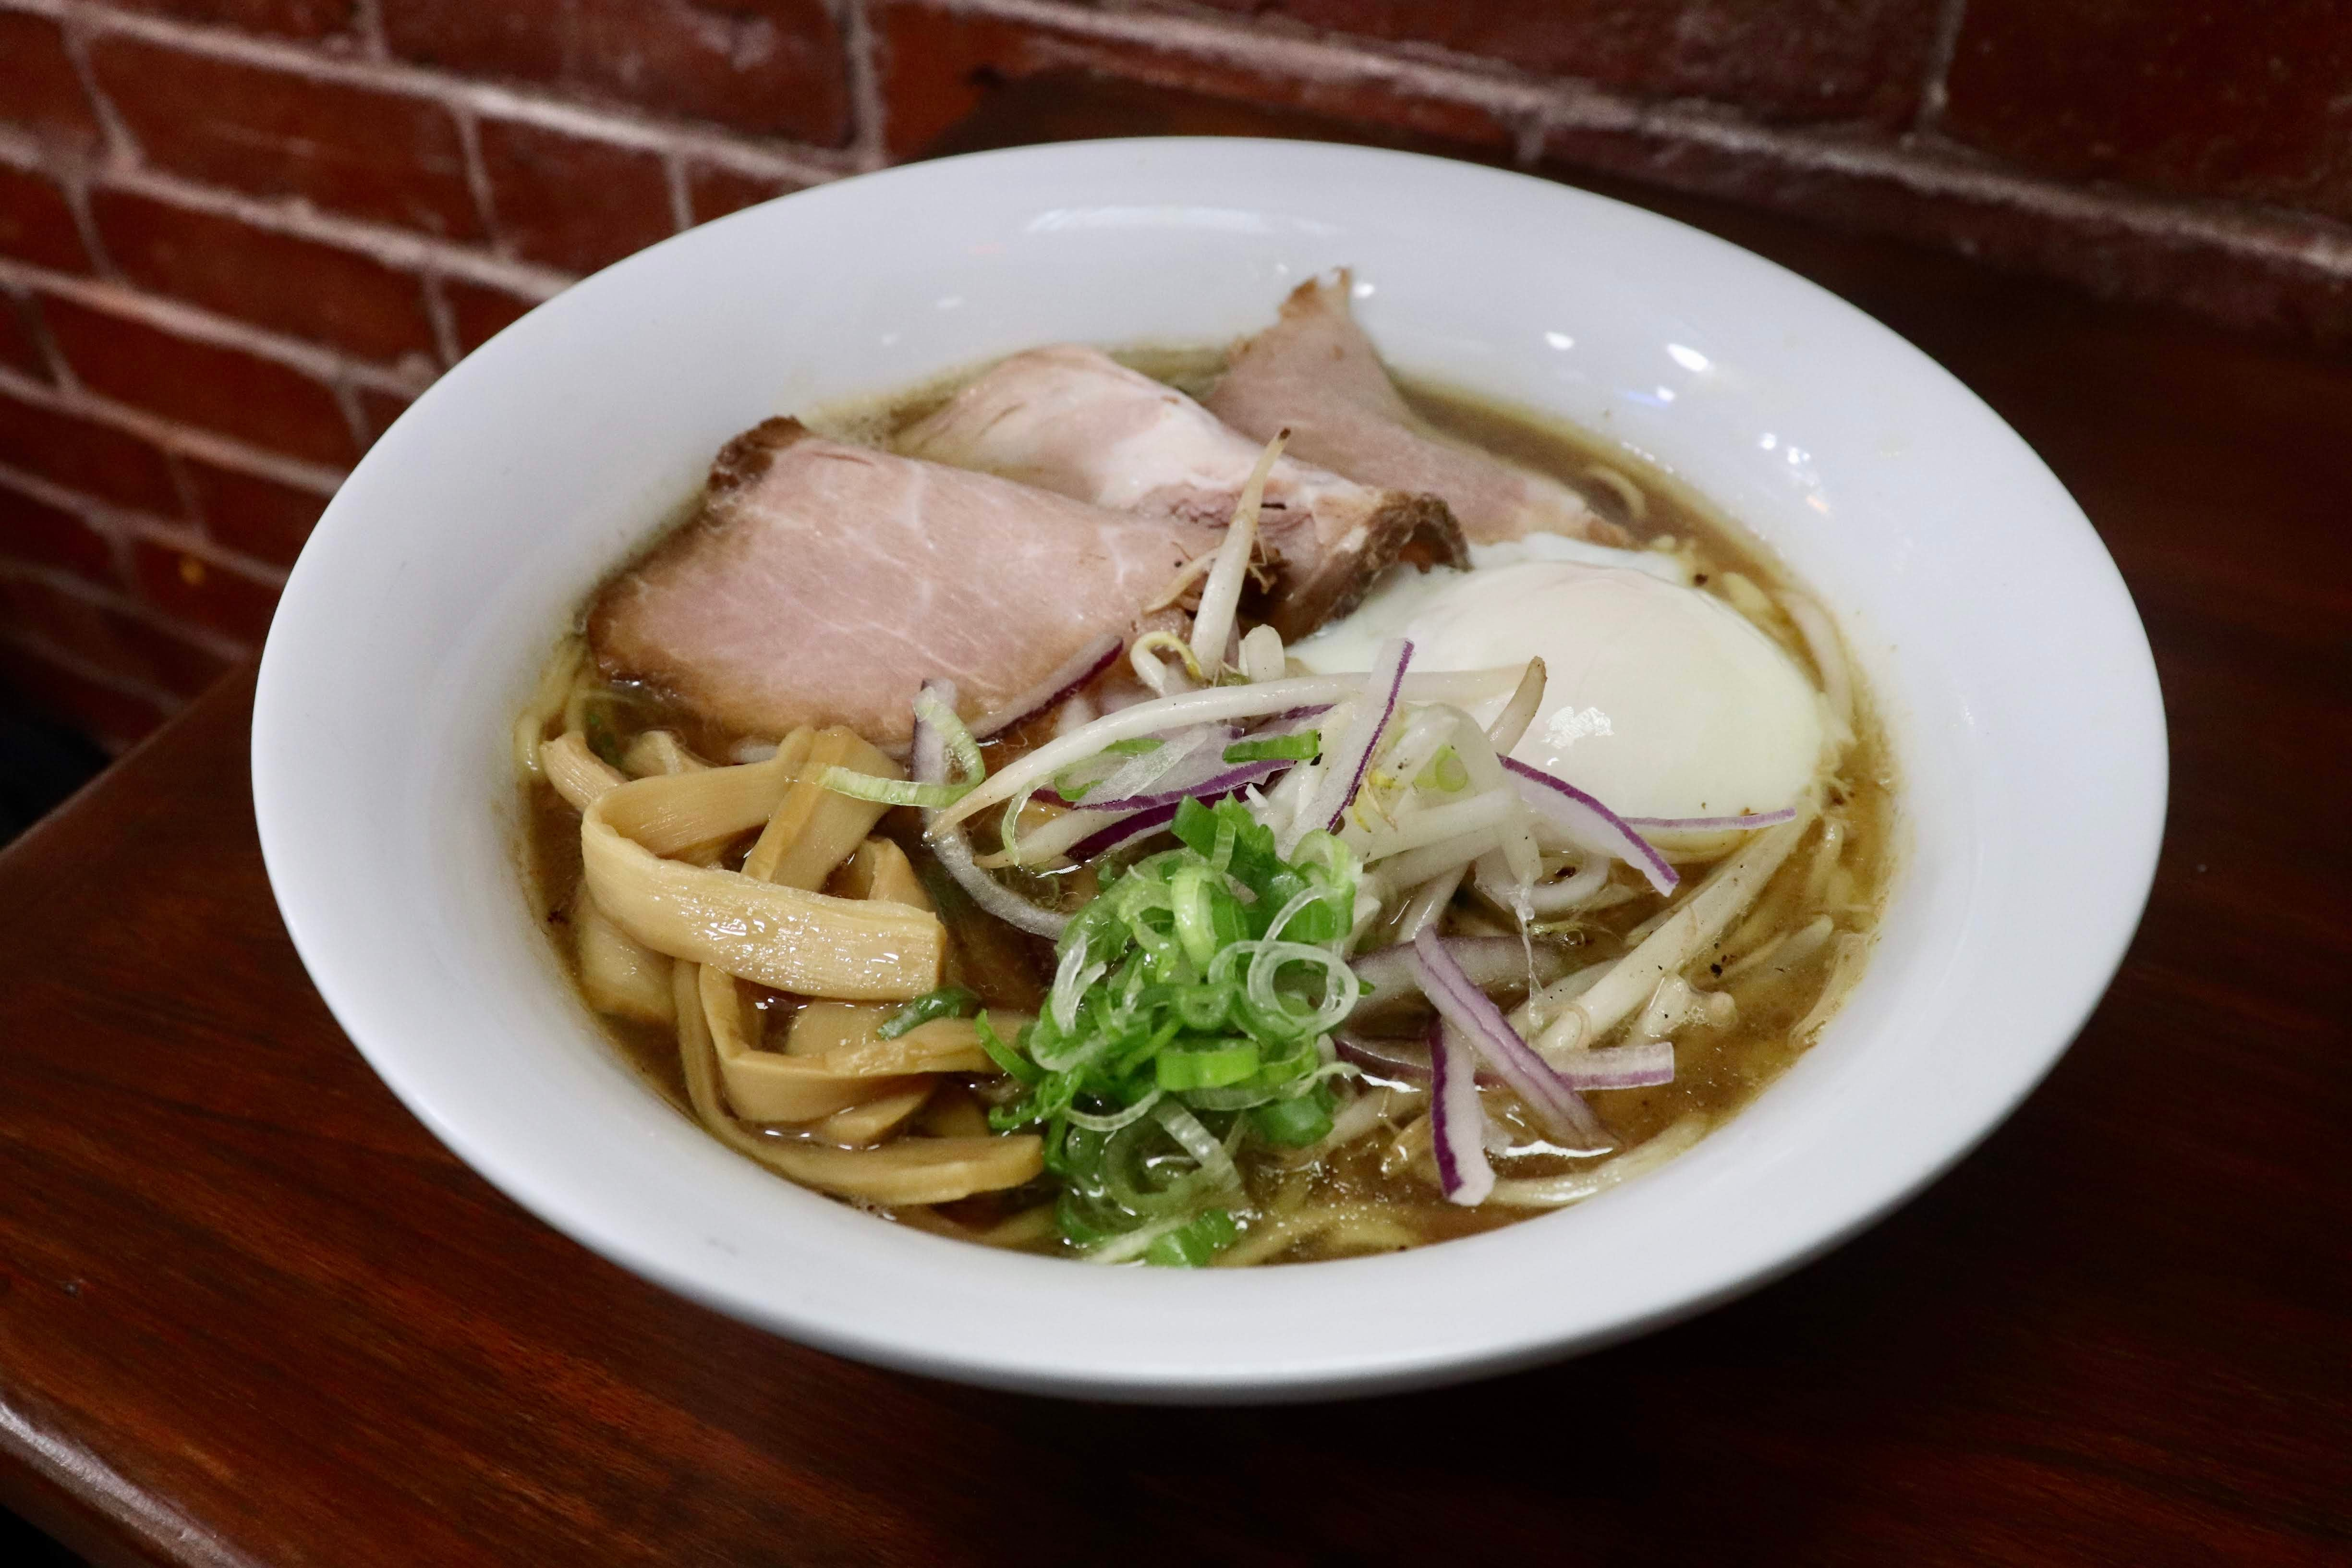 Shoyu ramen at Ebisuya Noodle